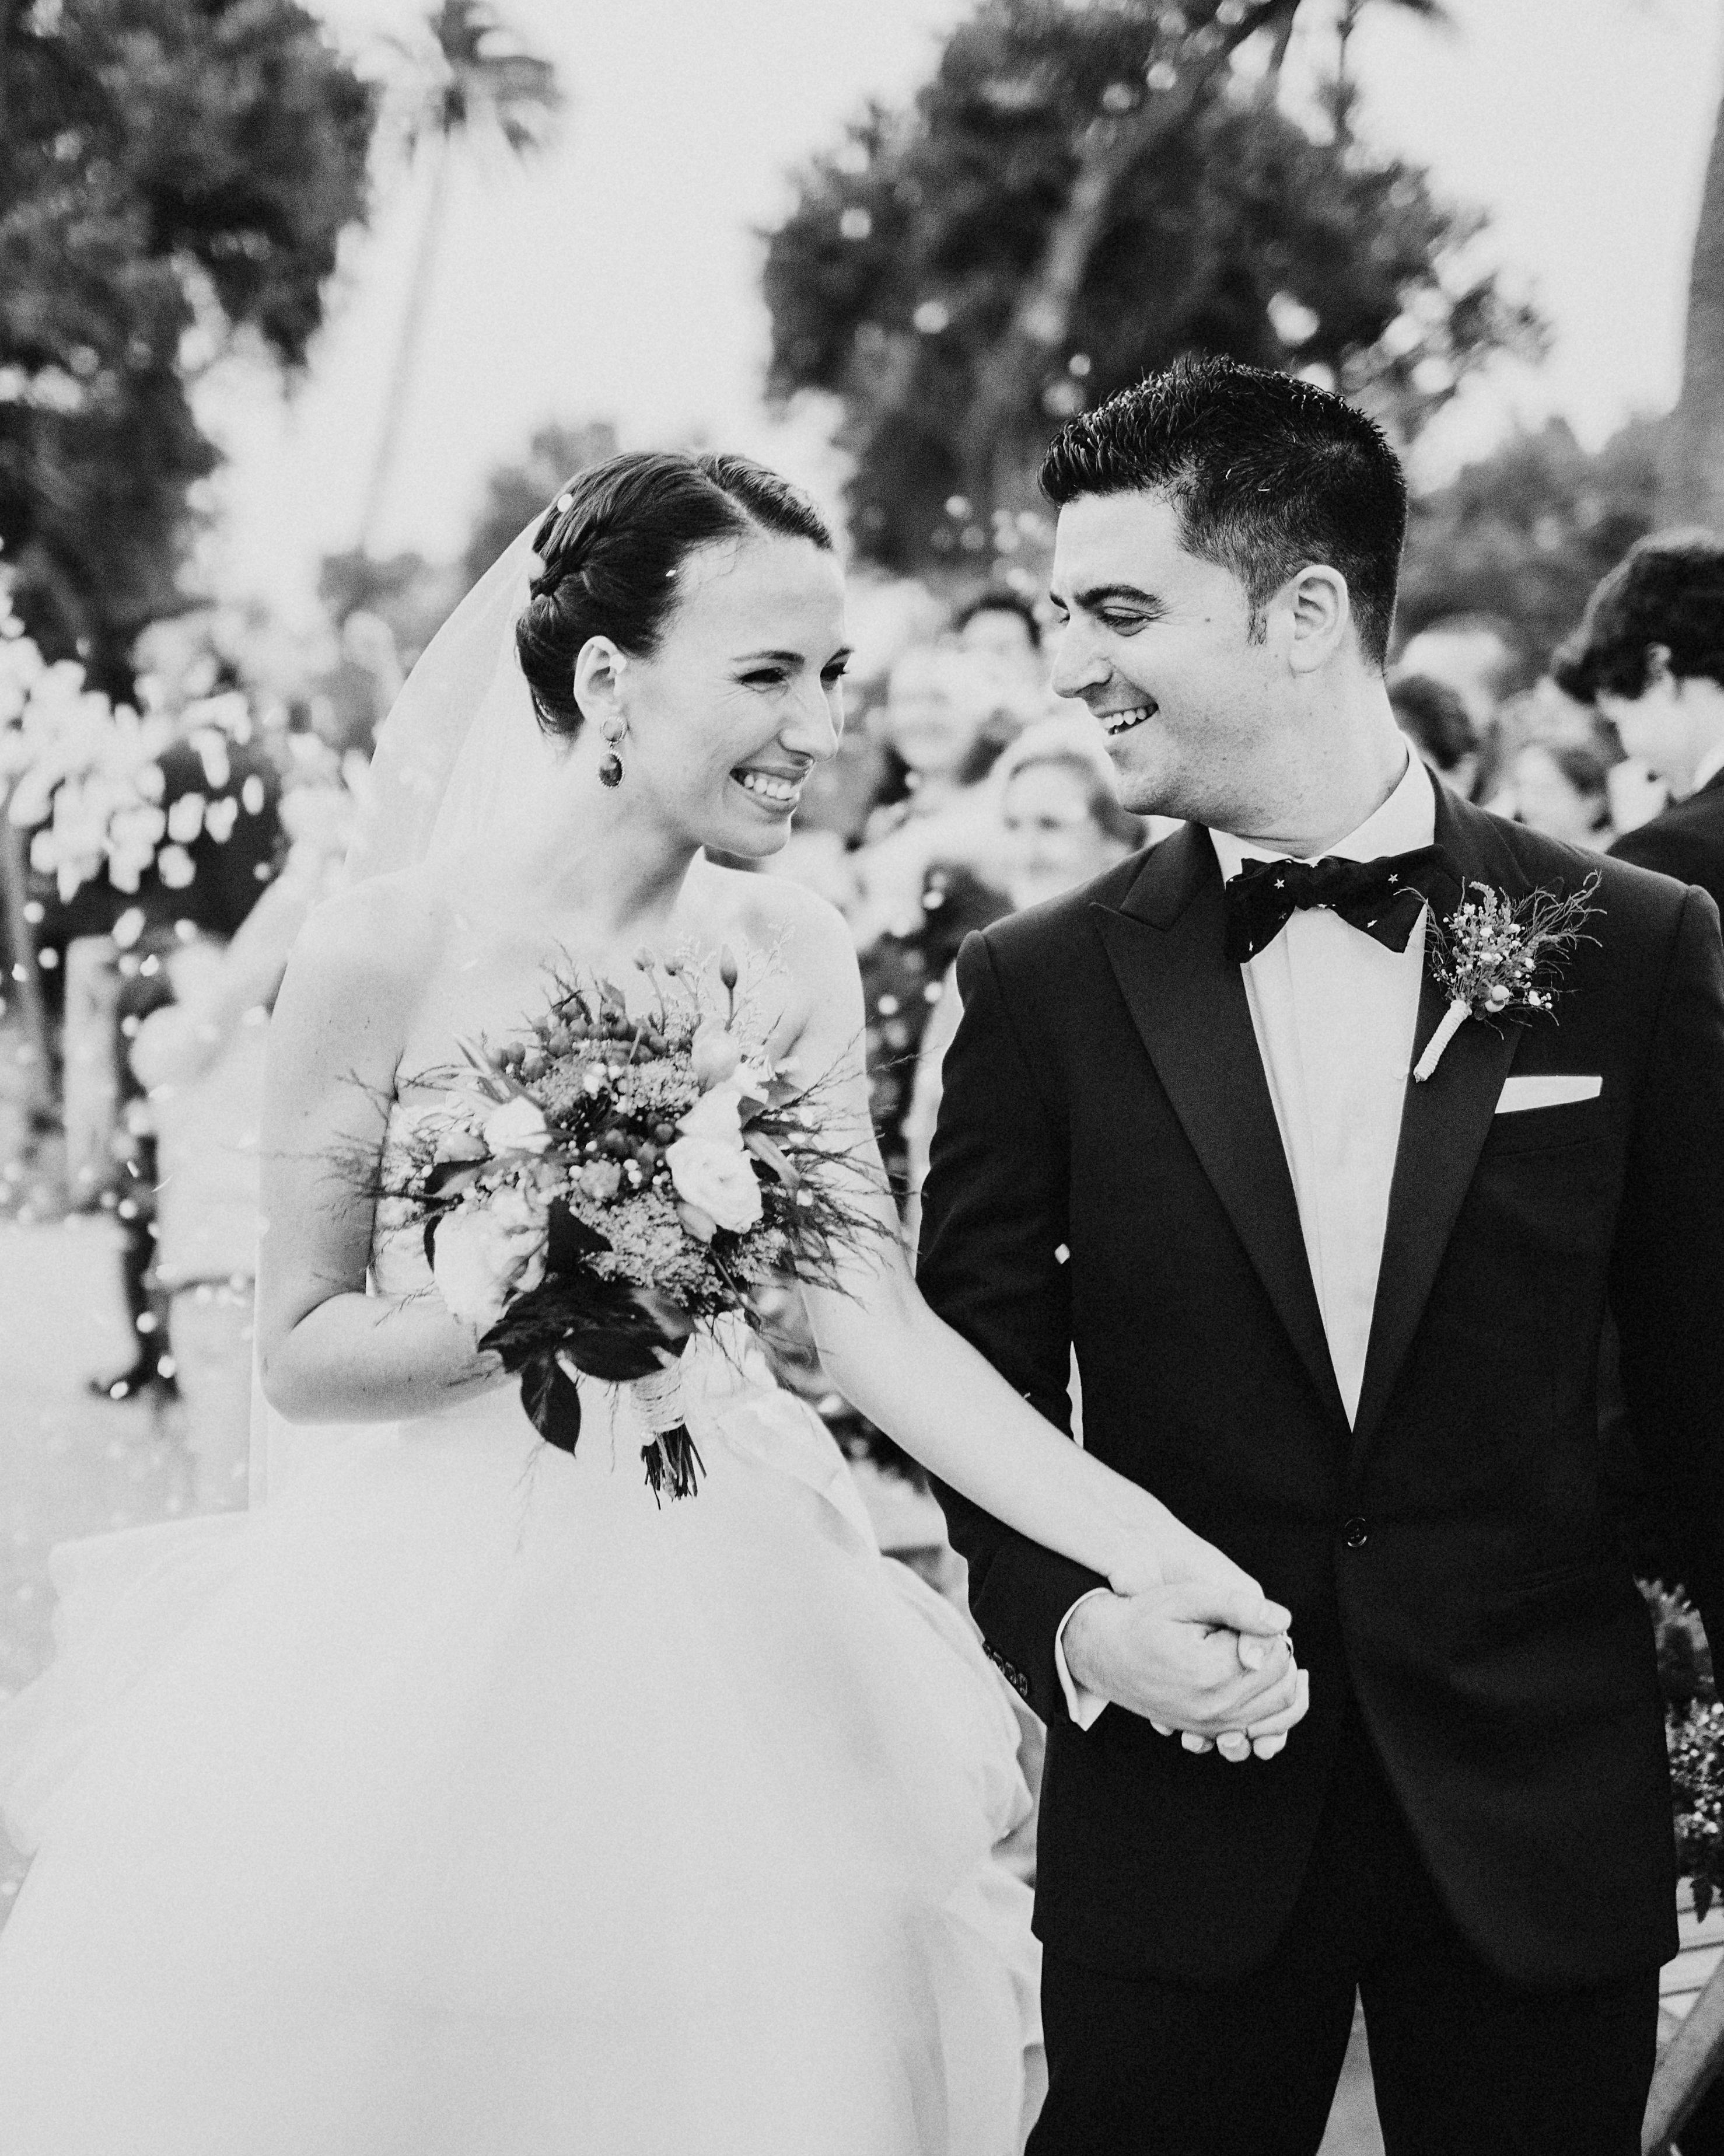 tamara-brett-wedding-ceremony-1251-s112120-0915.jpg